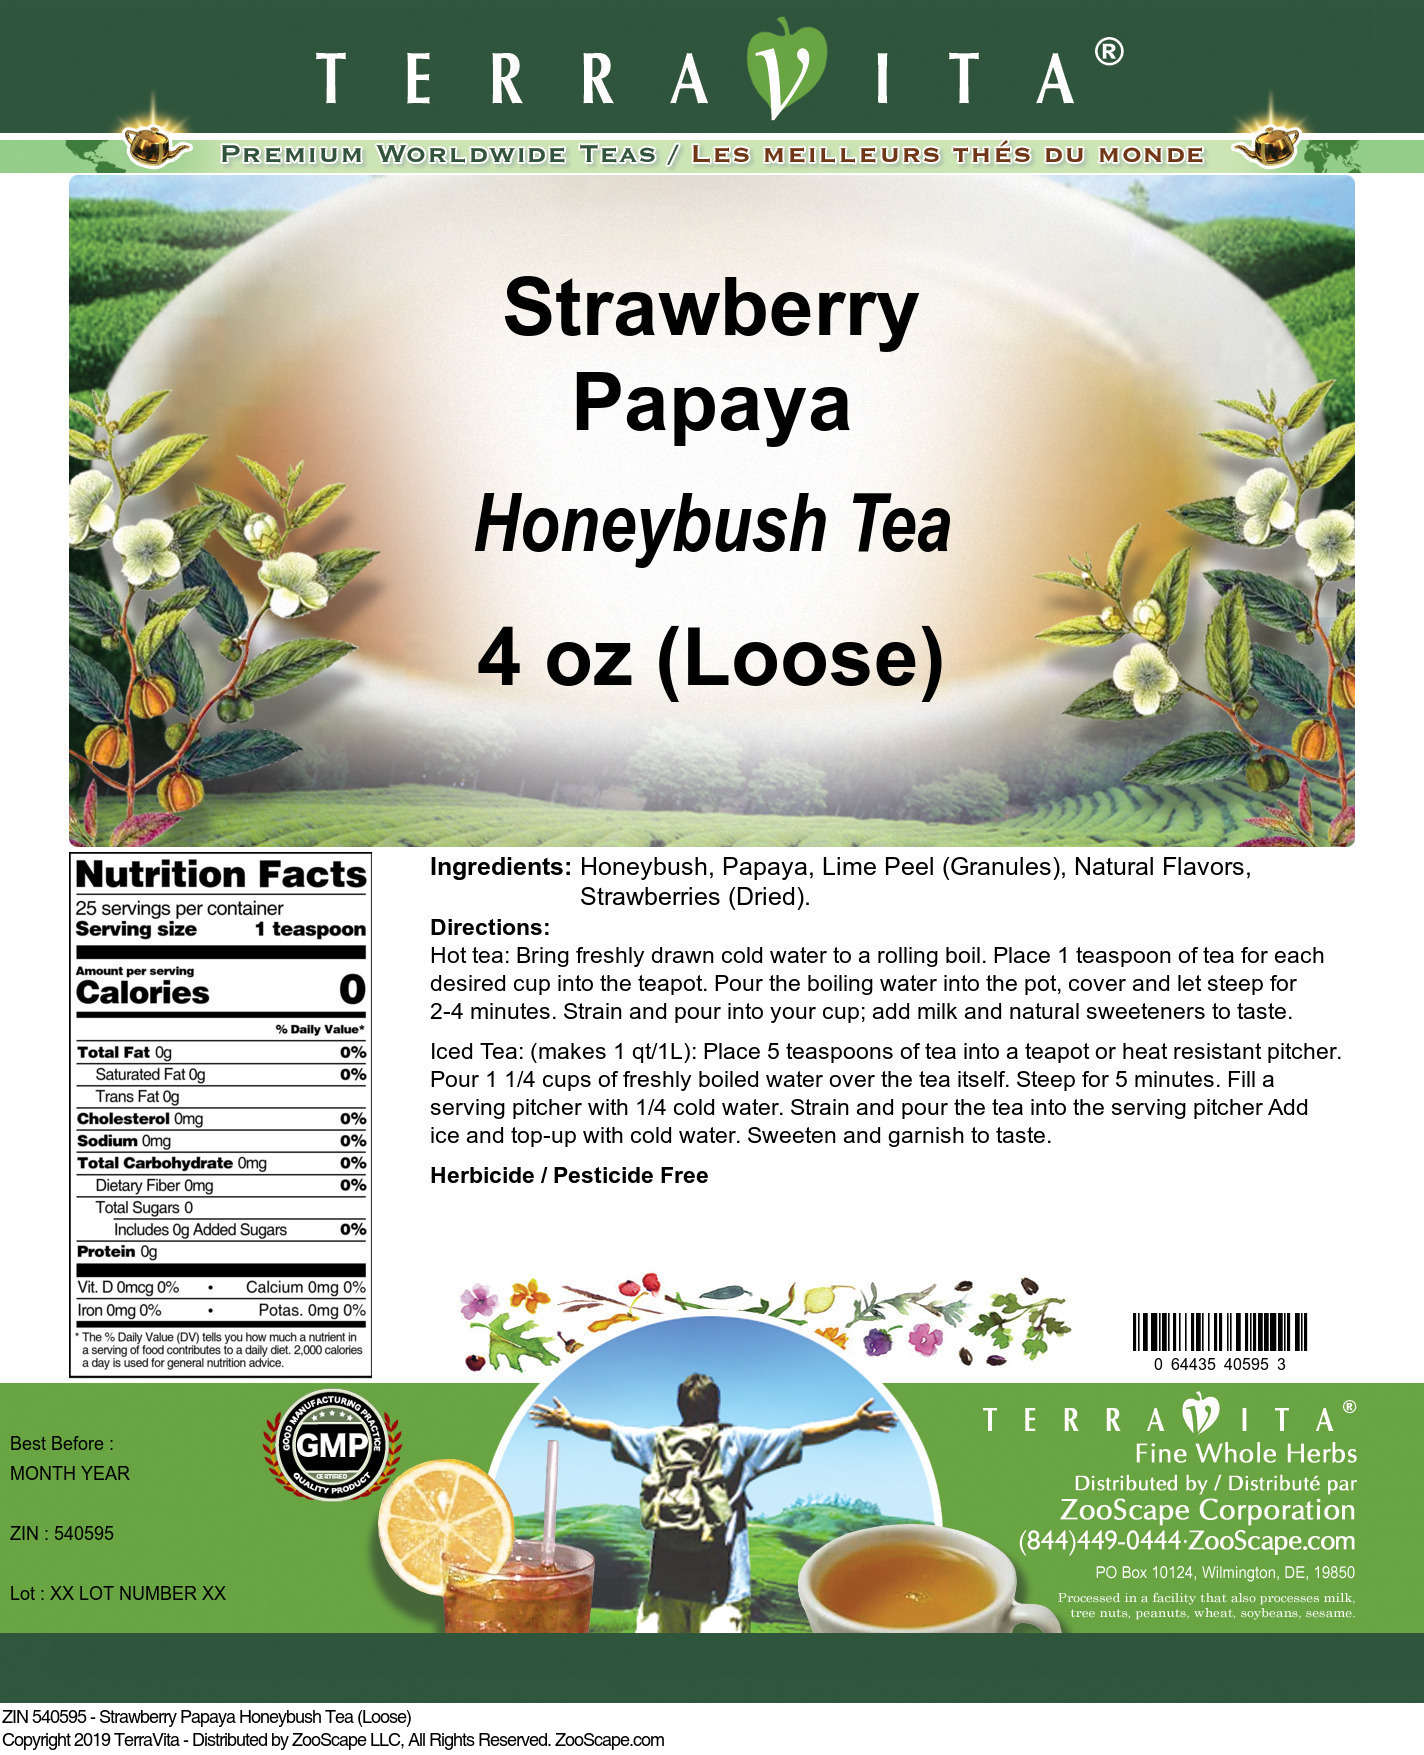 Strawberry Papaya Honeybush Tea (Loose)